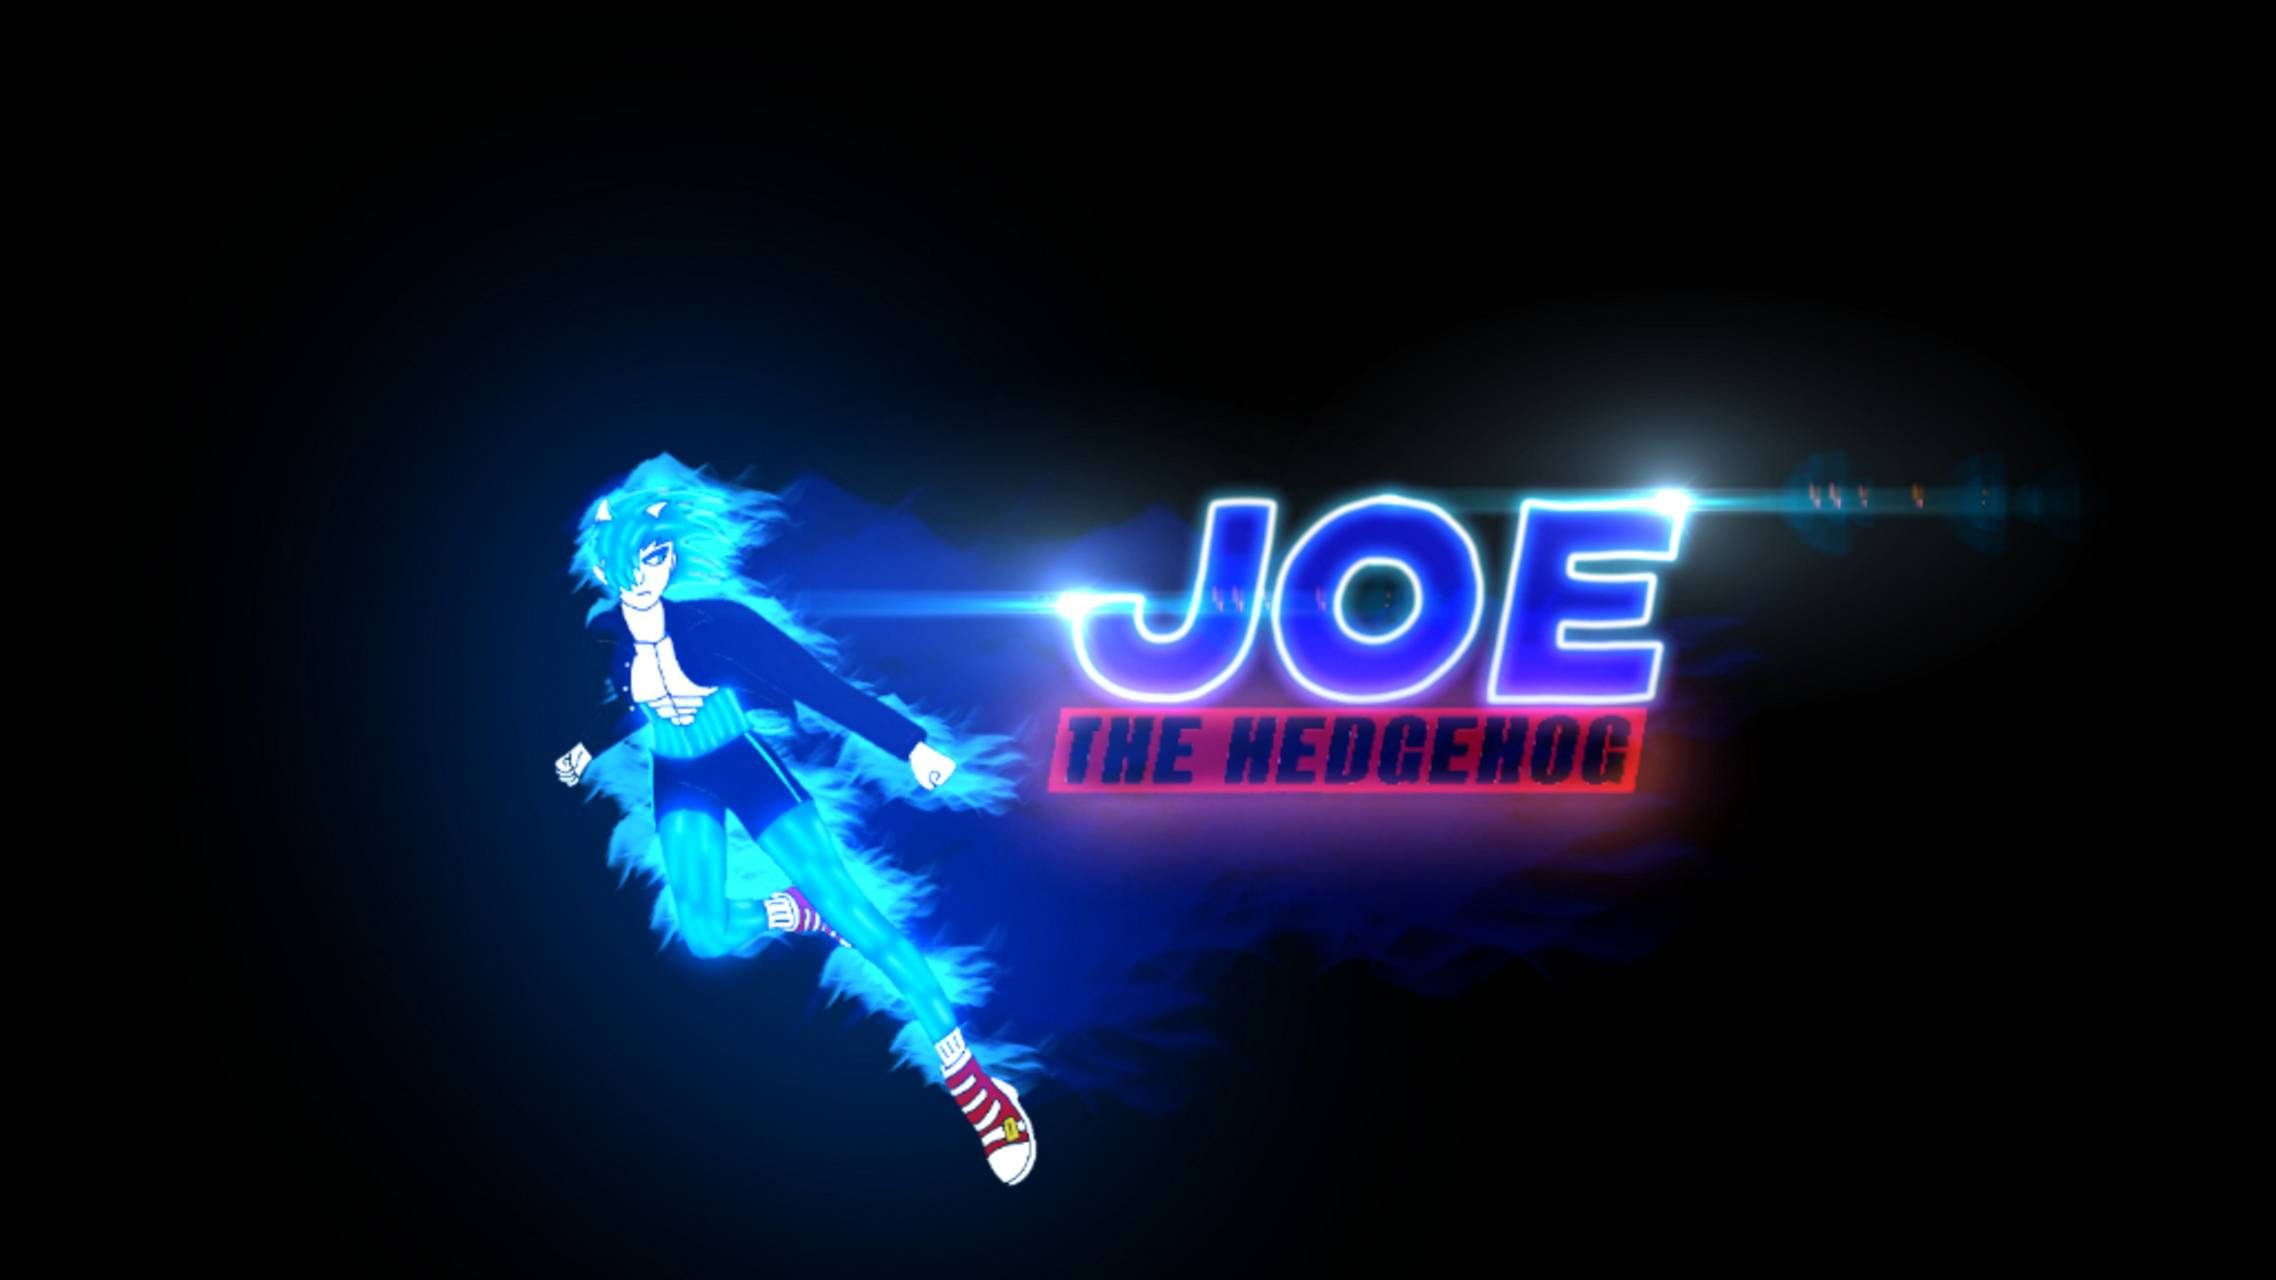 JoeXboxGamer